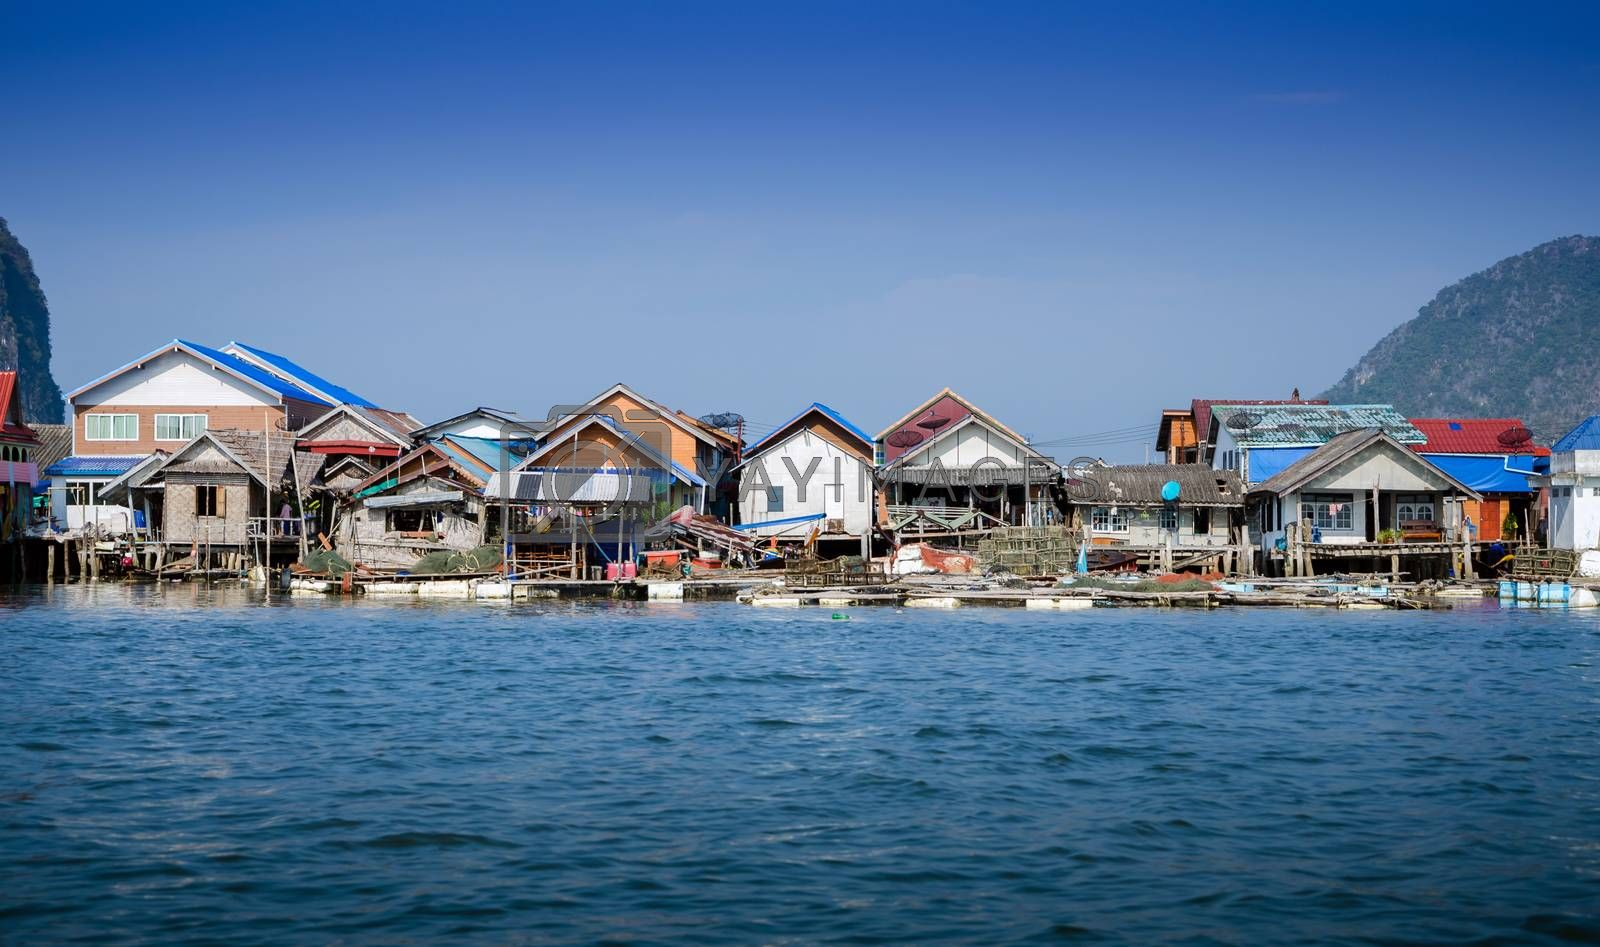 Royalty free image of Muslim floating village at Panyee island by siraanamwong